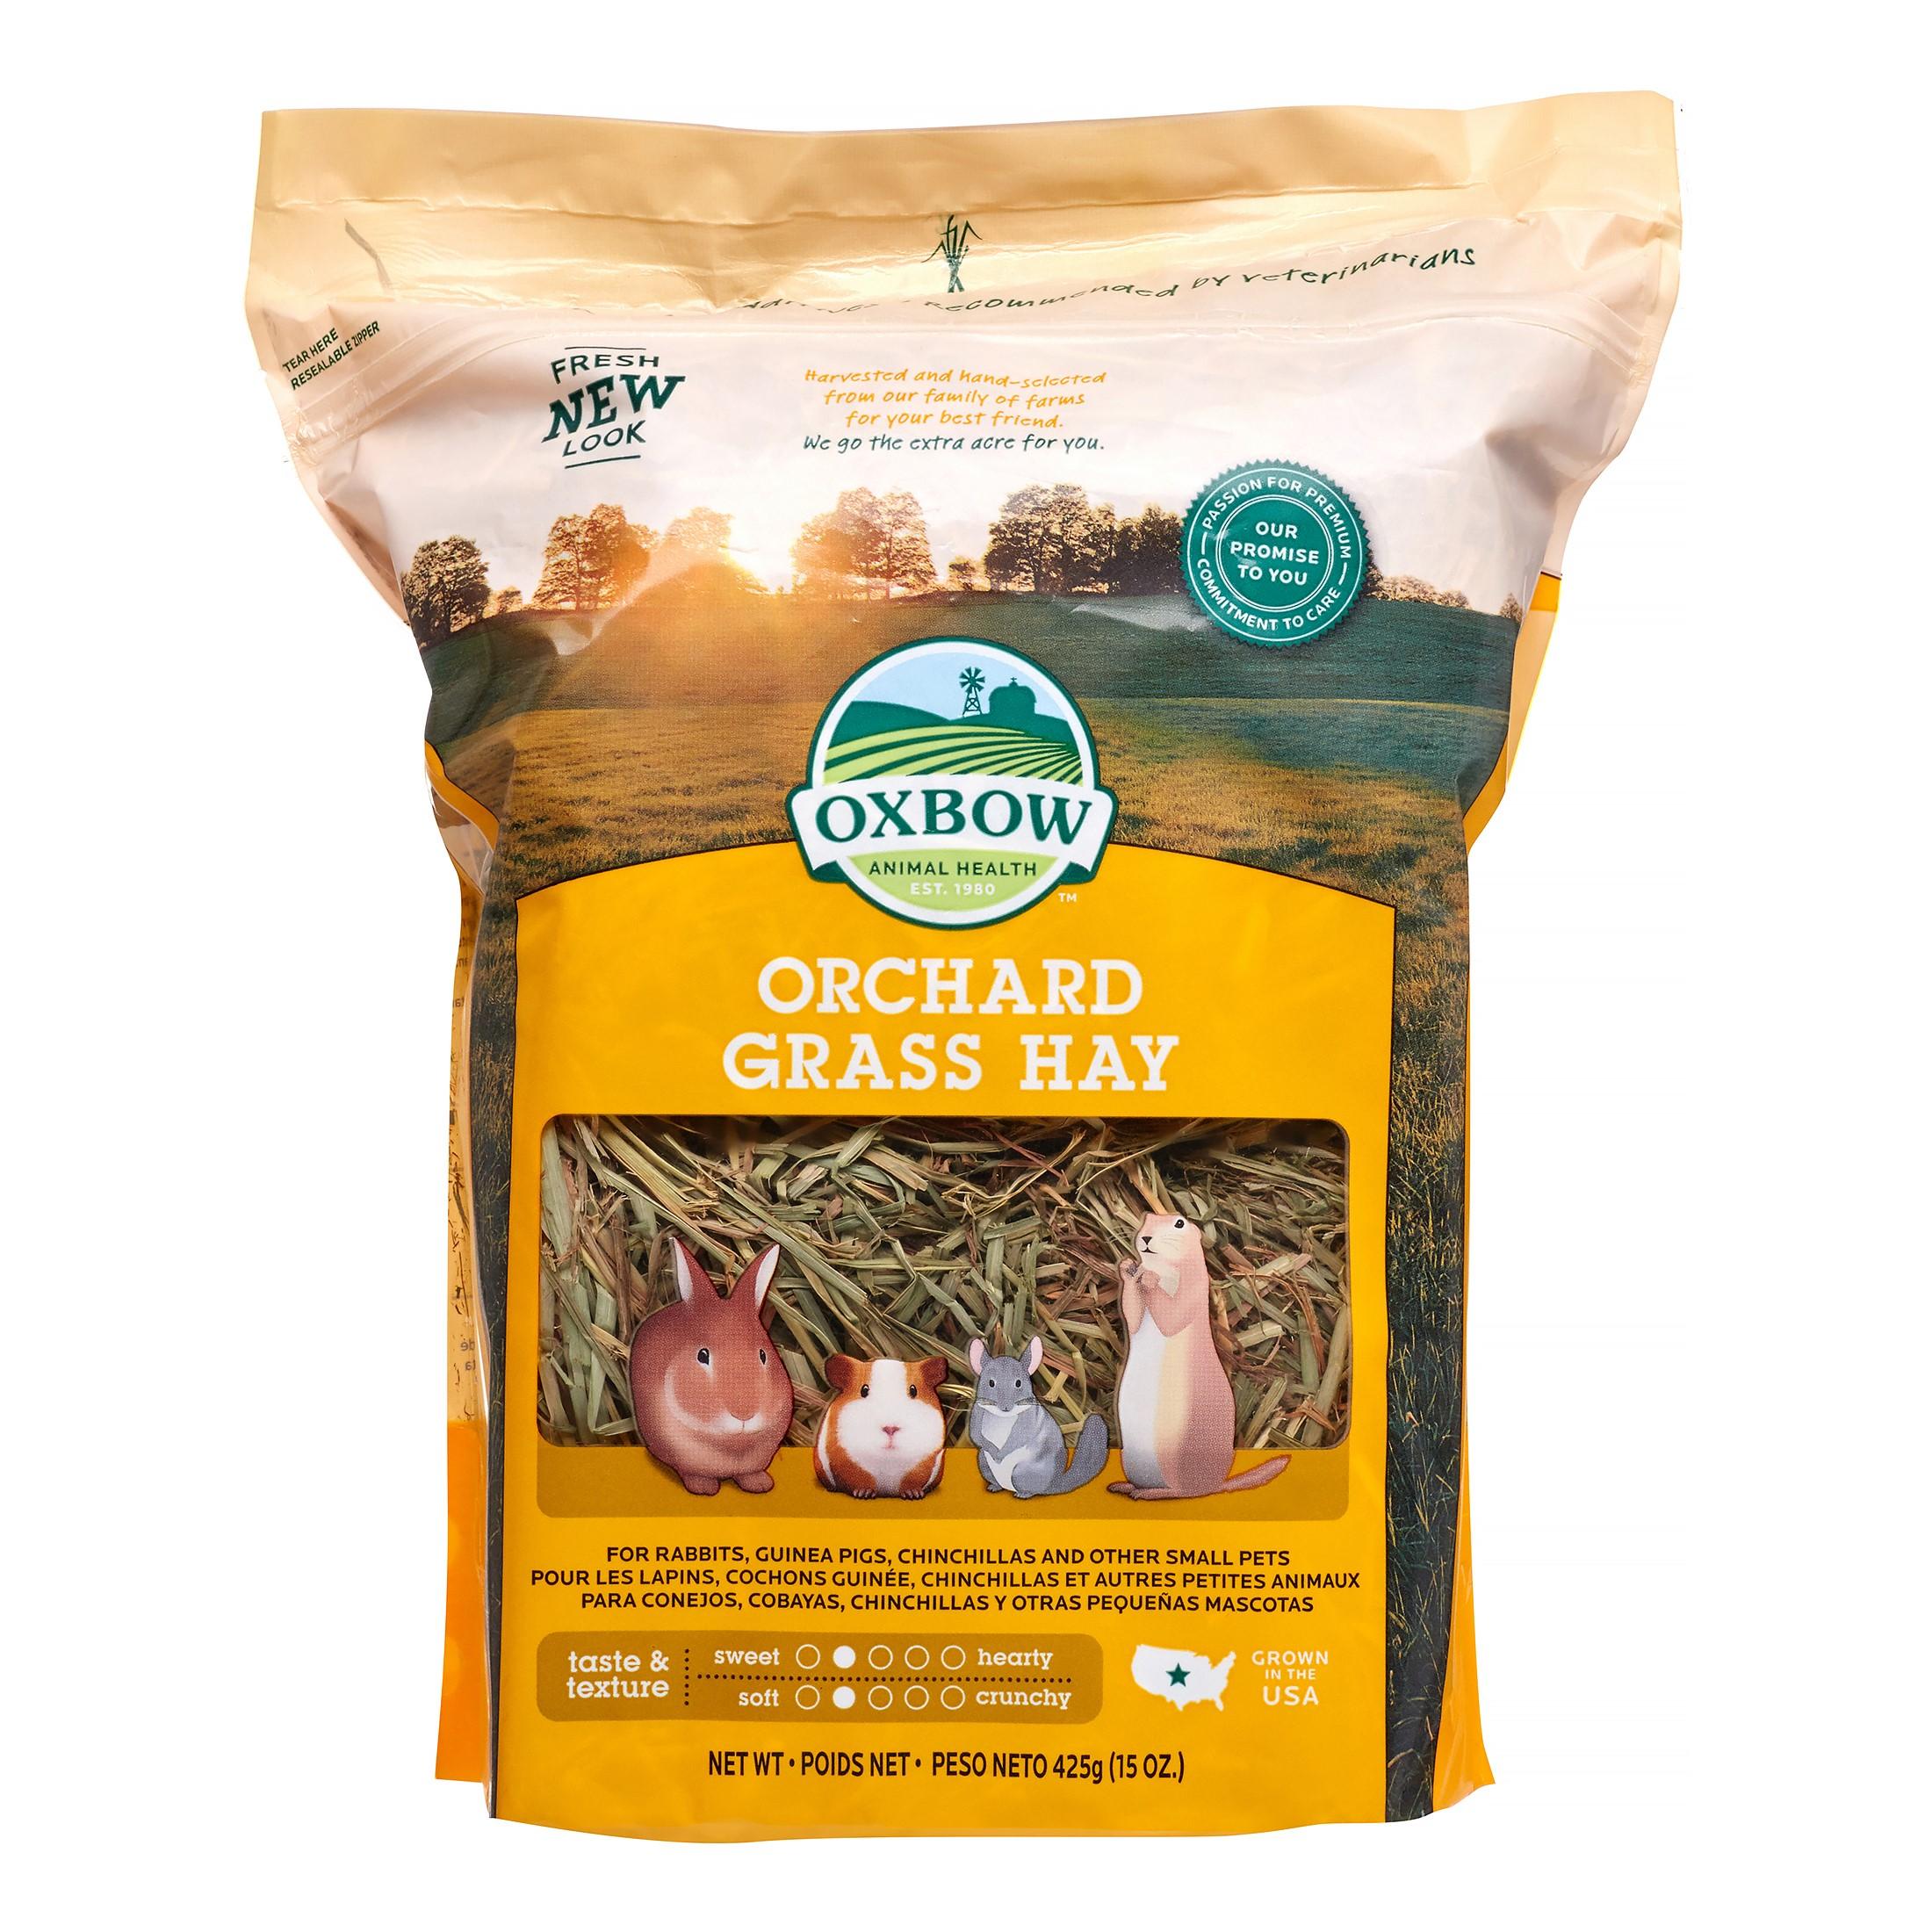 Oxbow Orchard Grass Dry Small Animal Food, 15 Oz